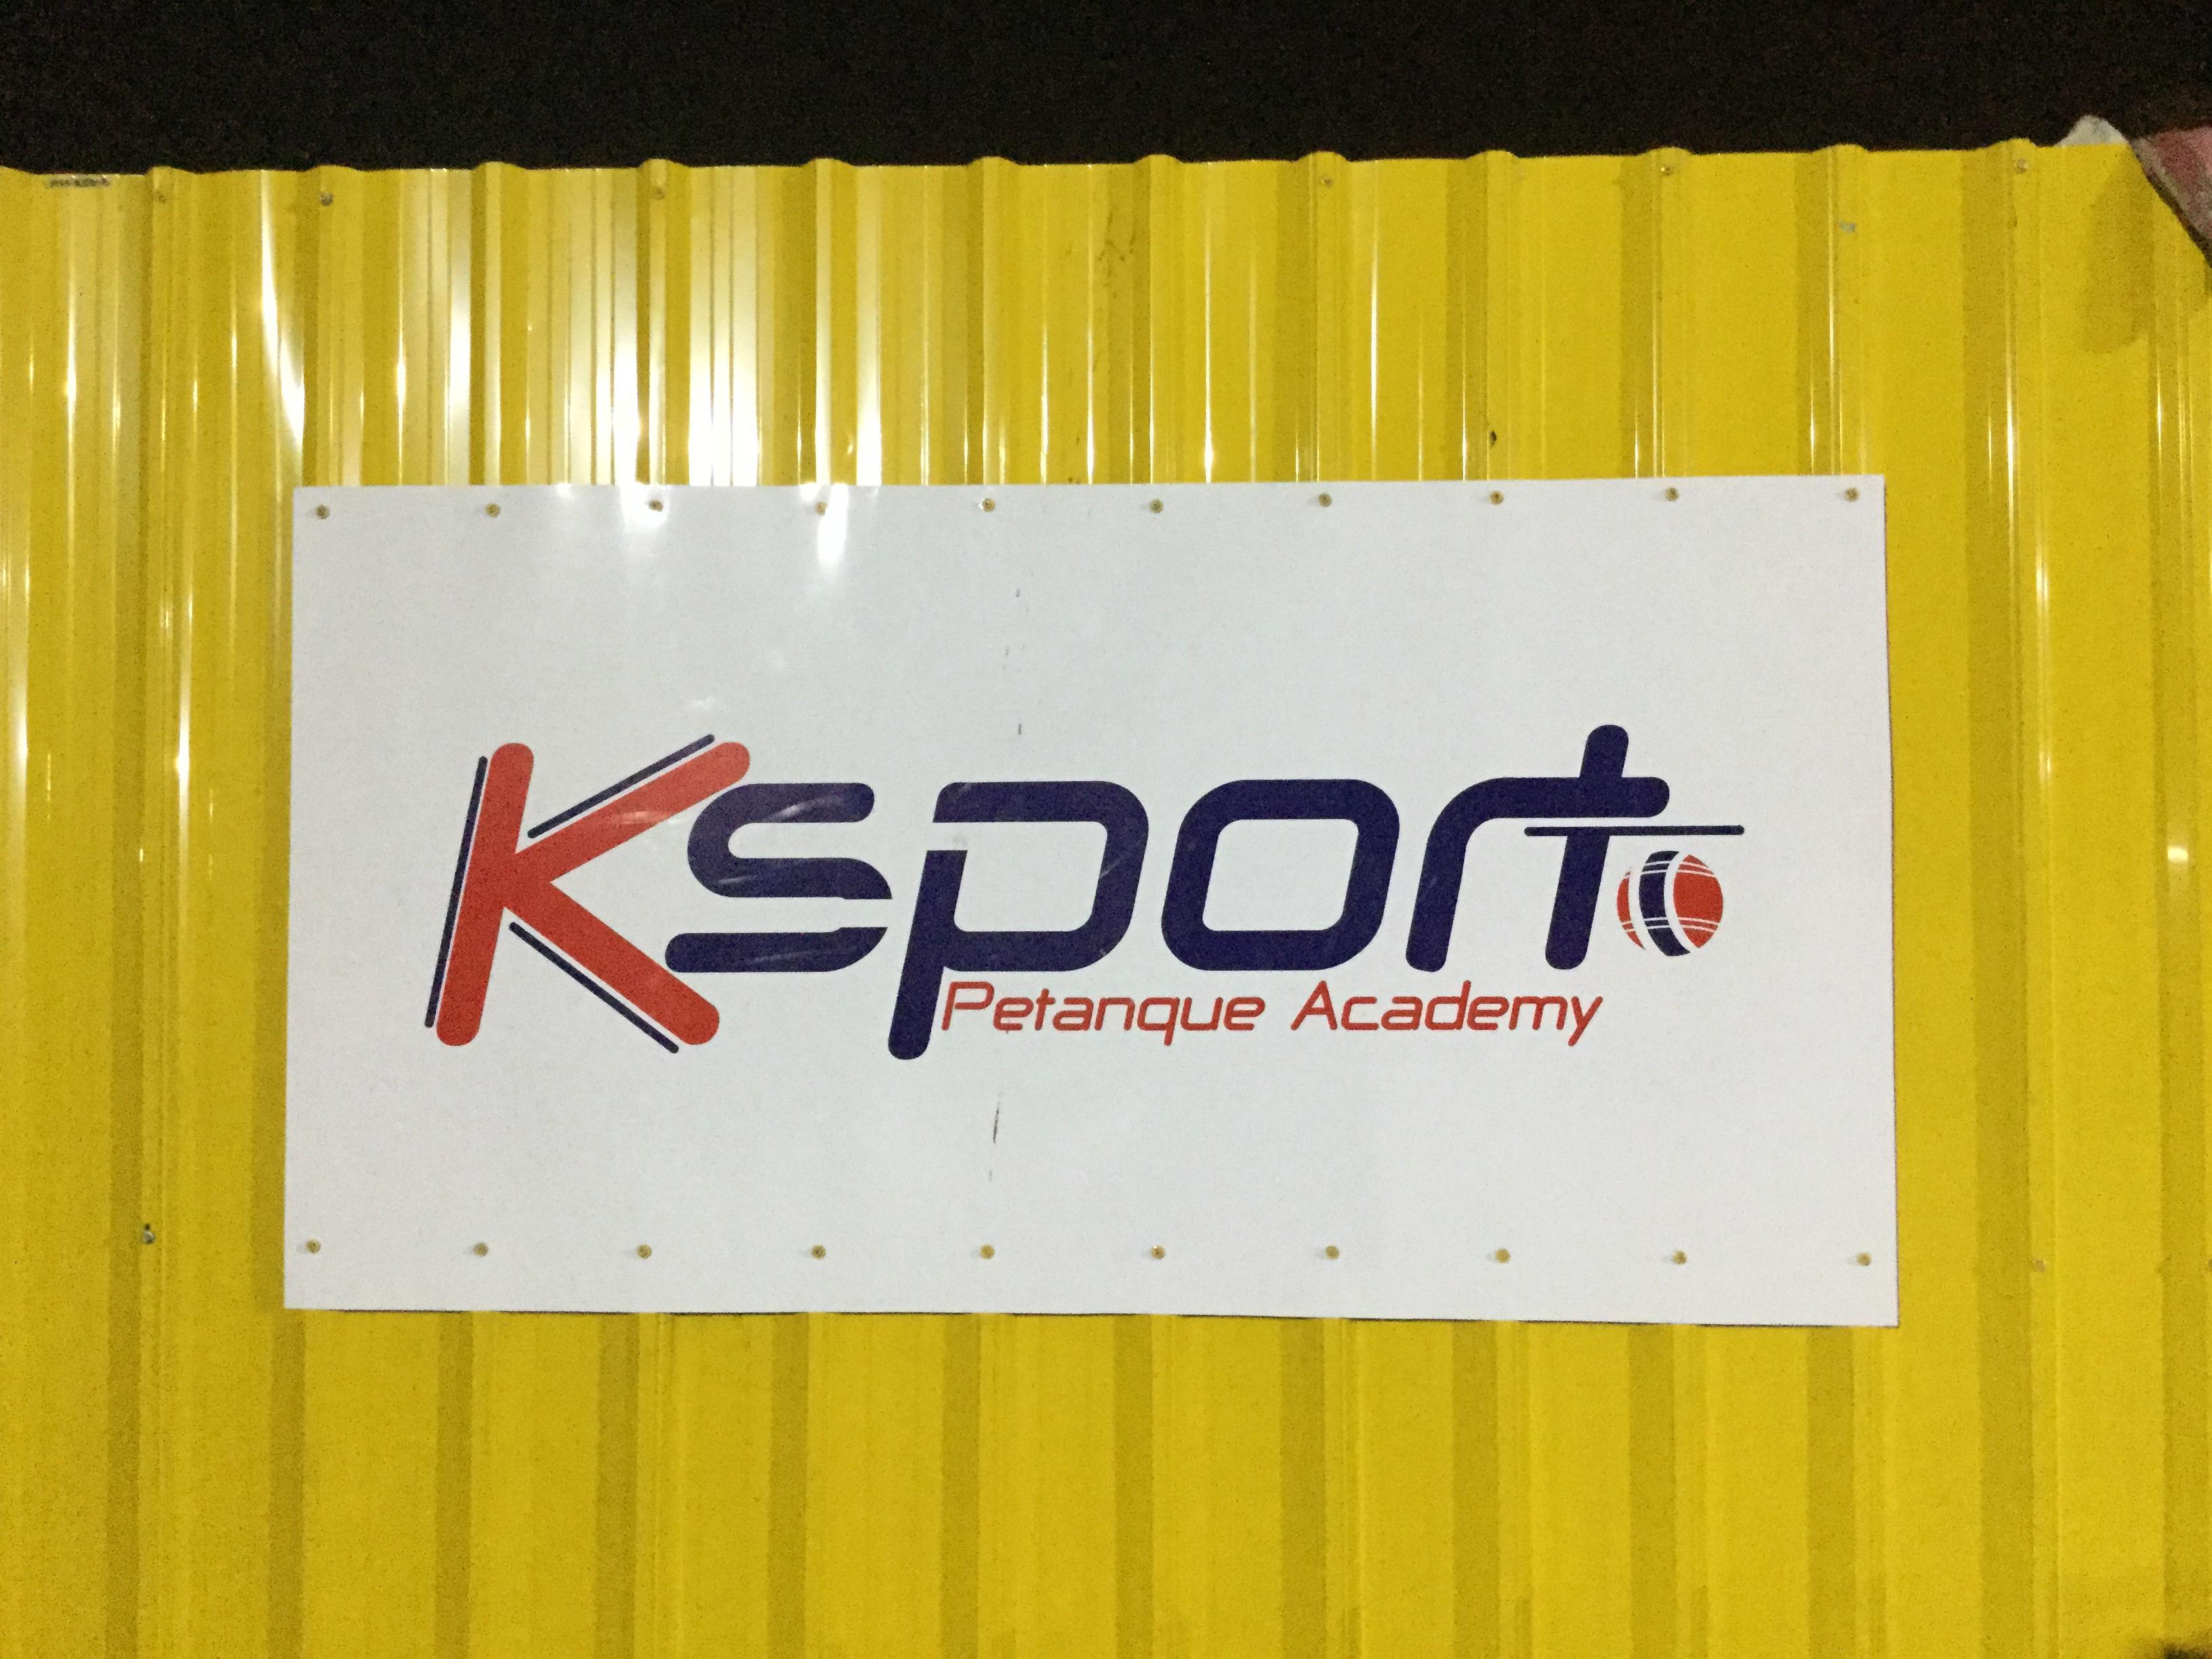 KSport Pétanque Académy Bangkok